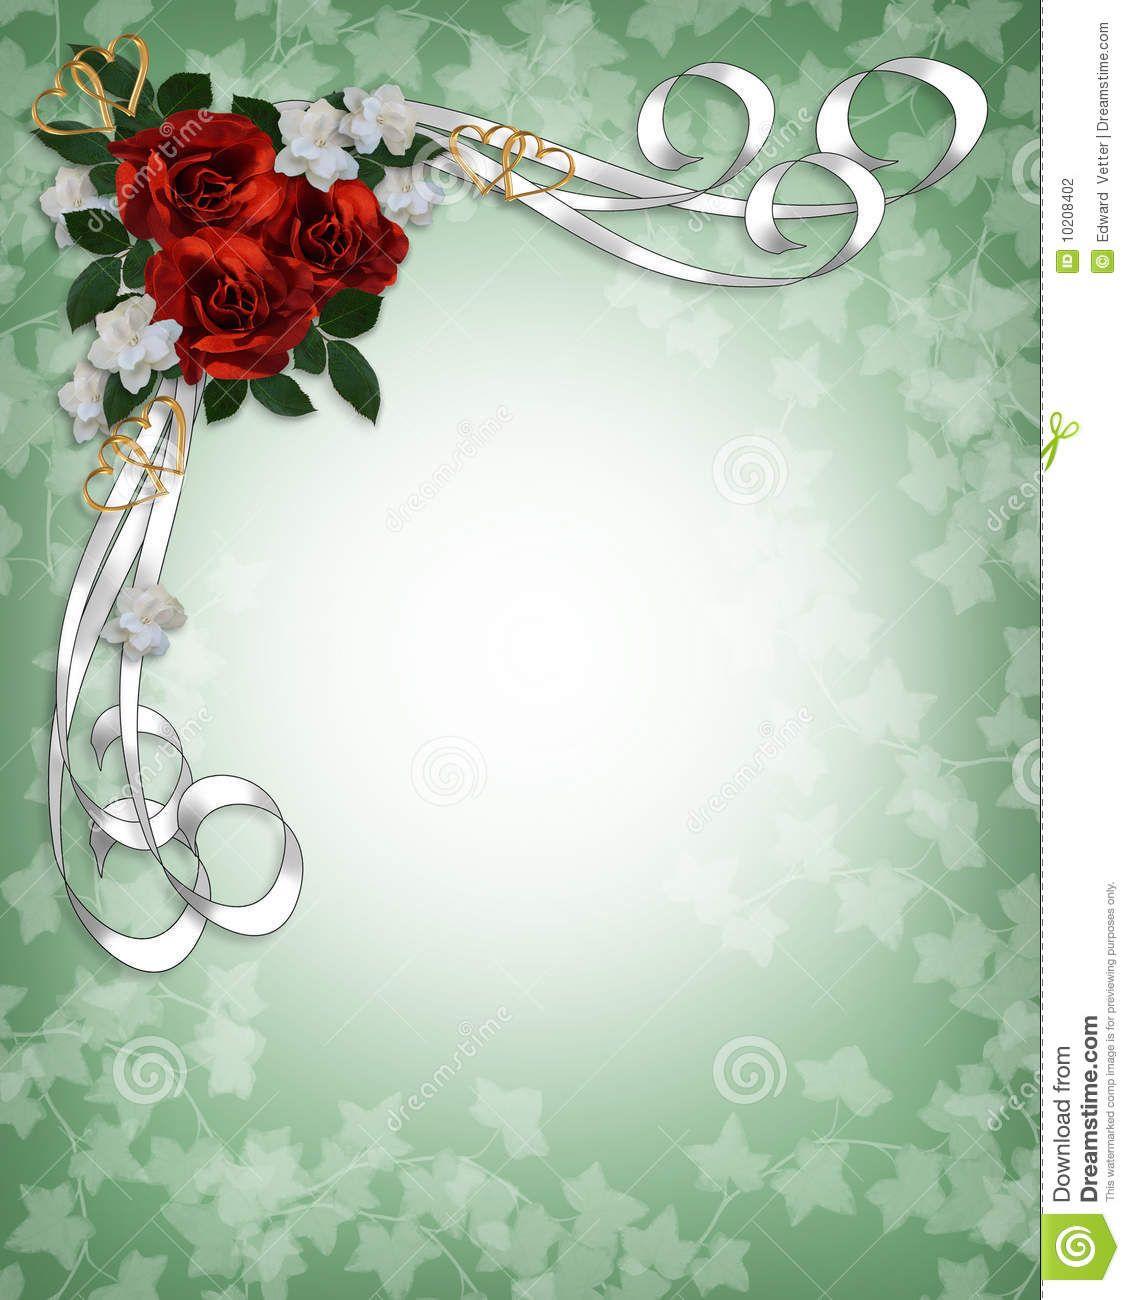 Wedding Borders: Wedding Invitation Red Roses Border Stock Photography